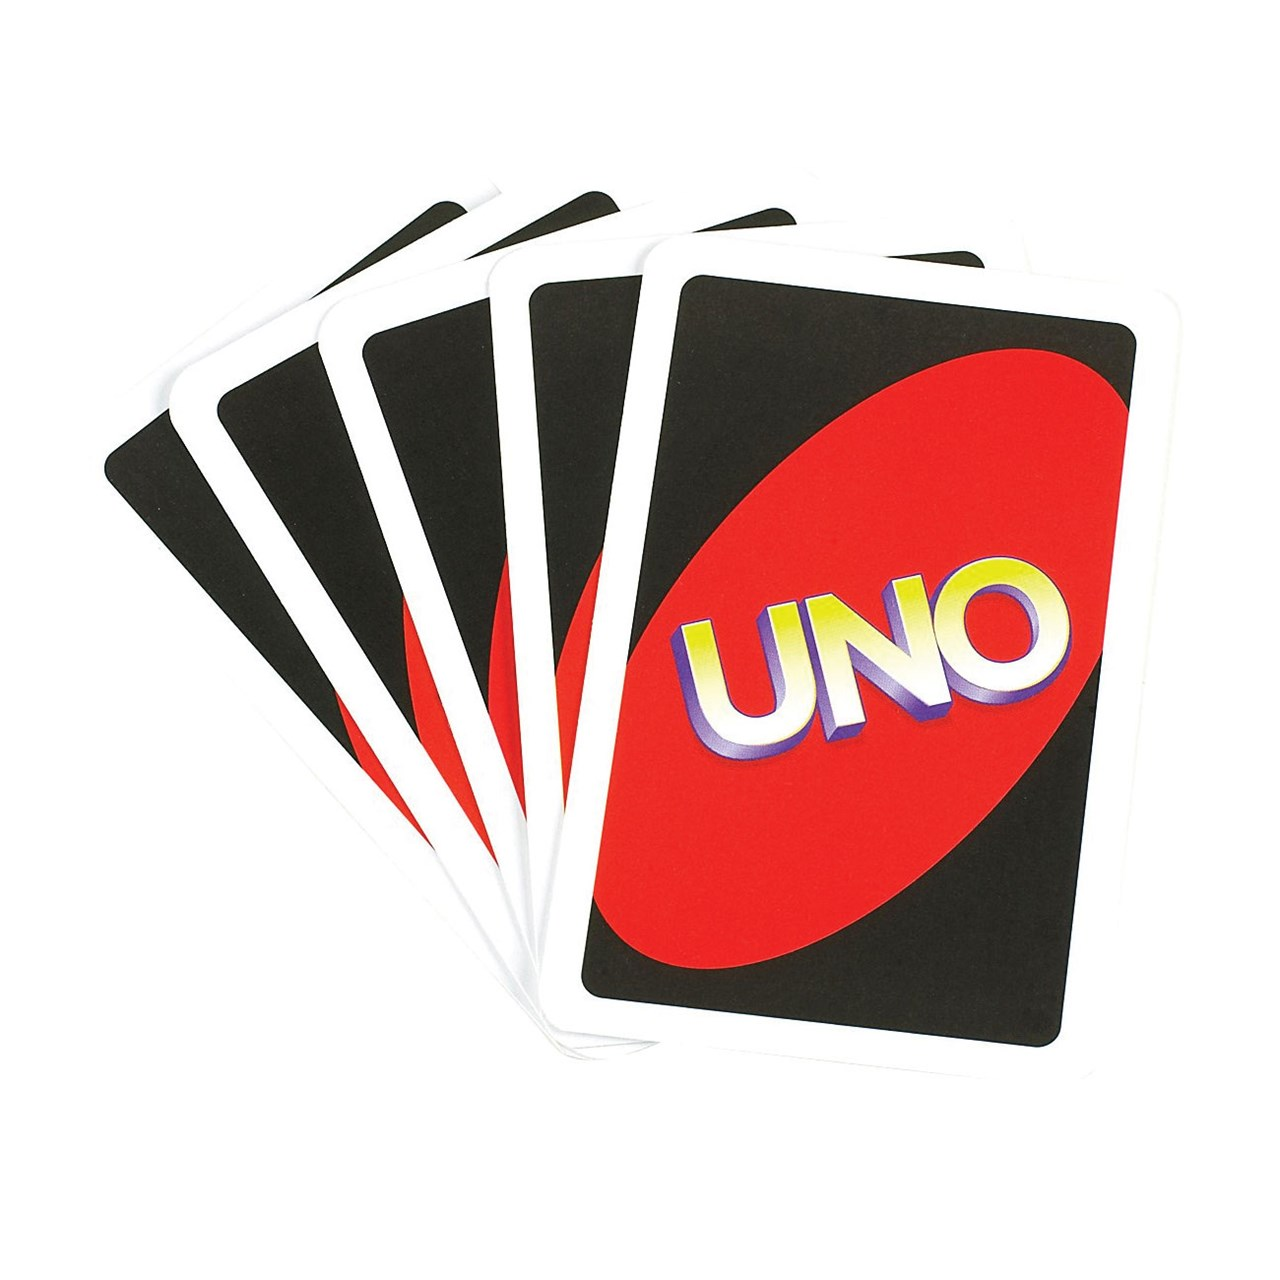 Uno Card Vector At GetDrawings